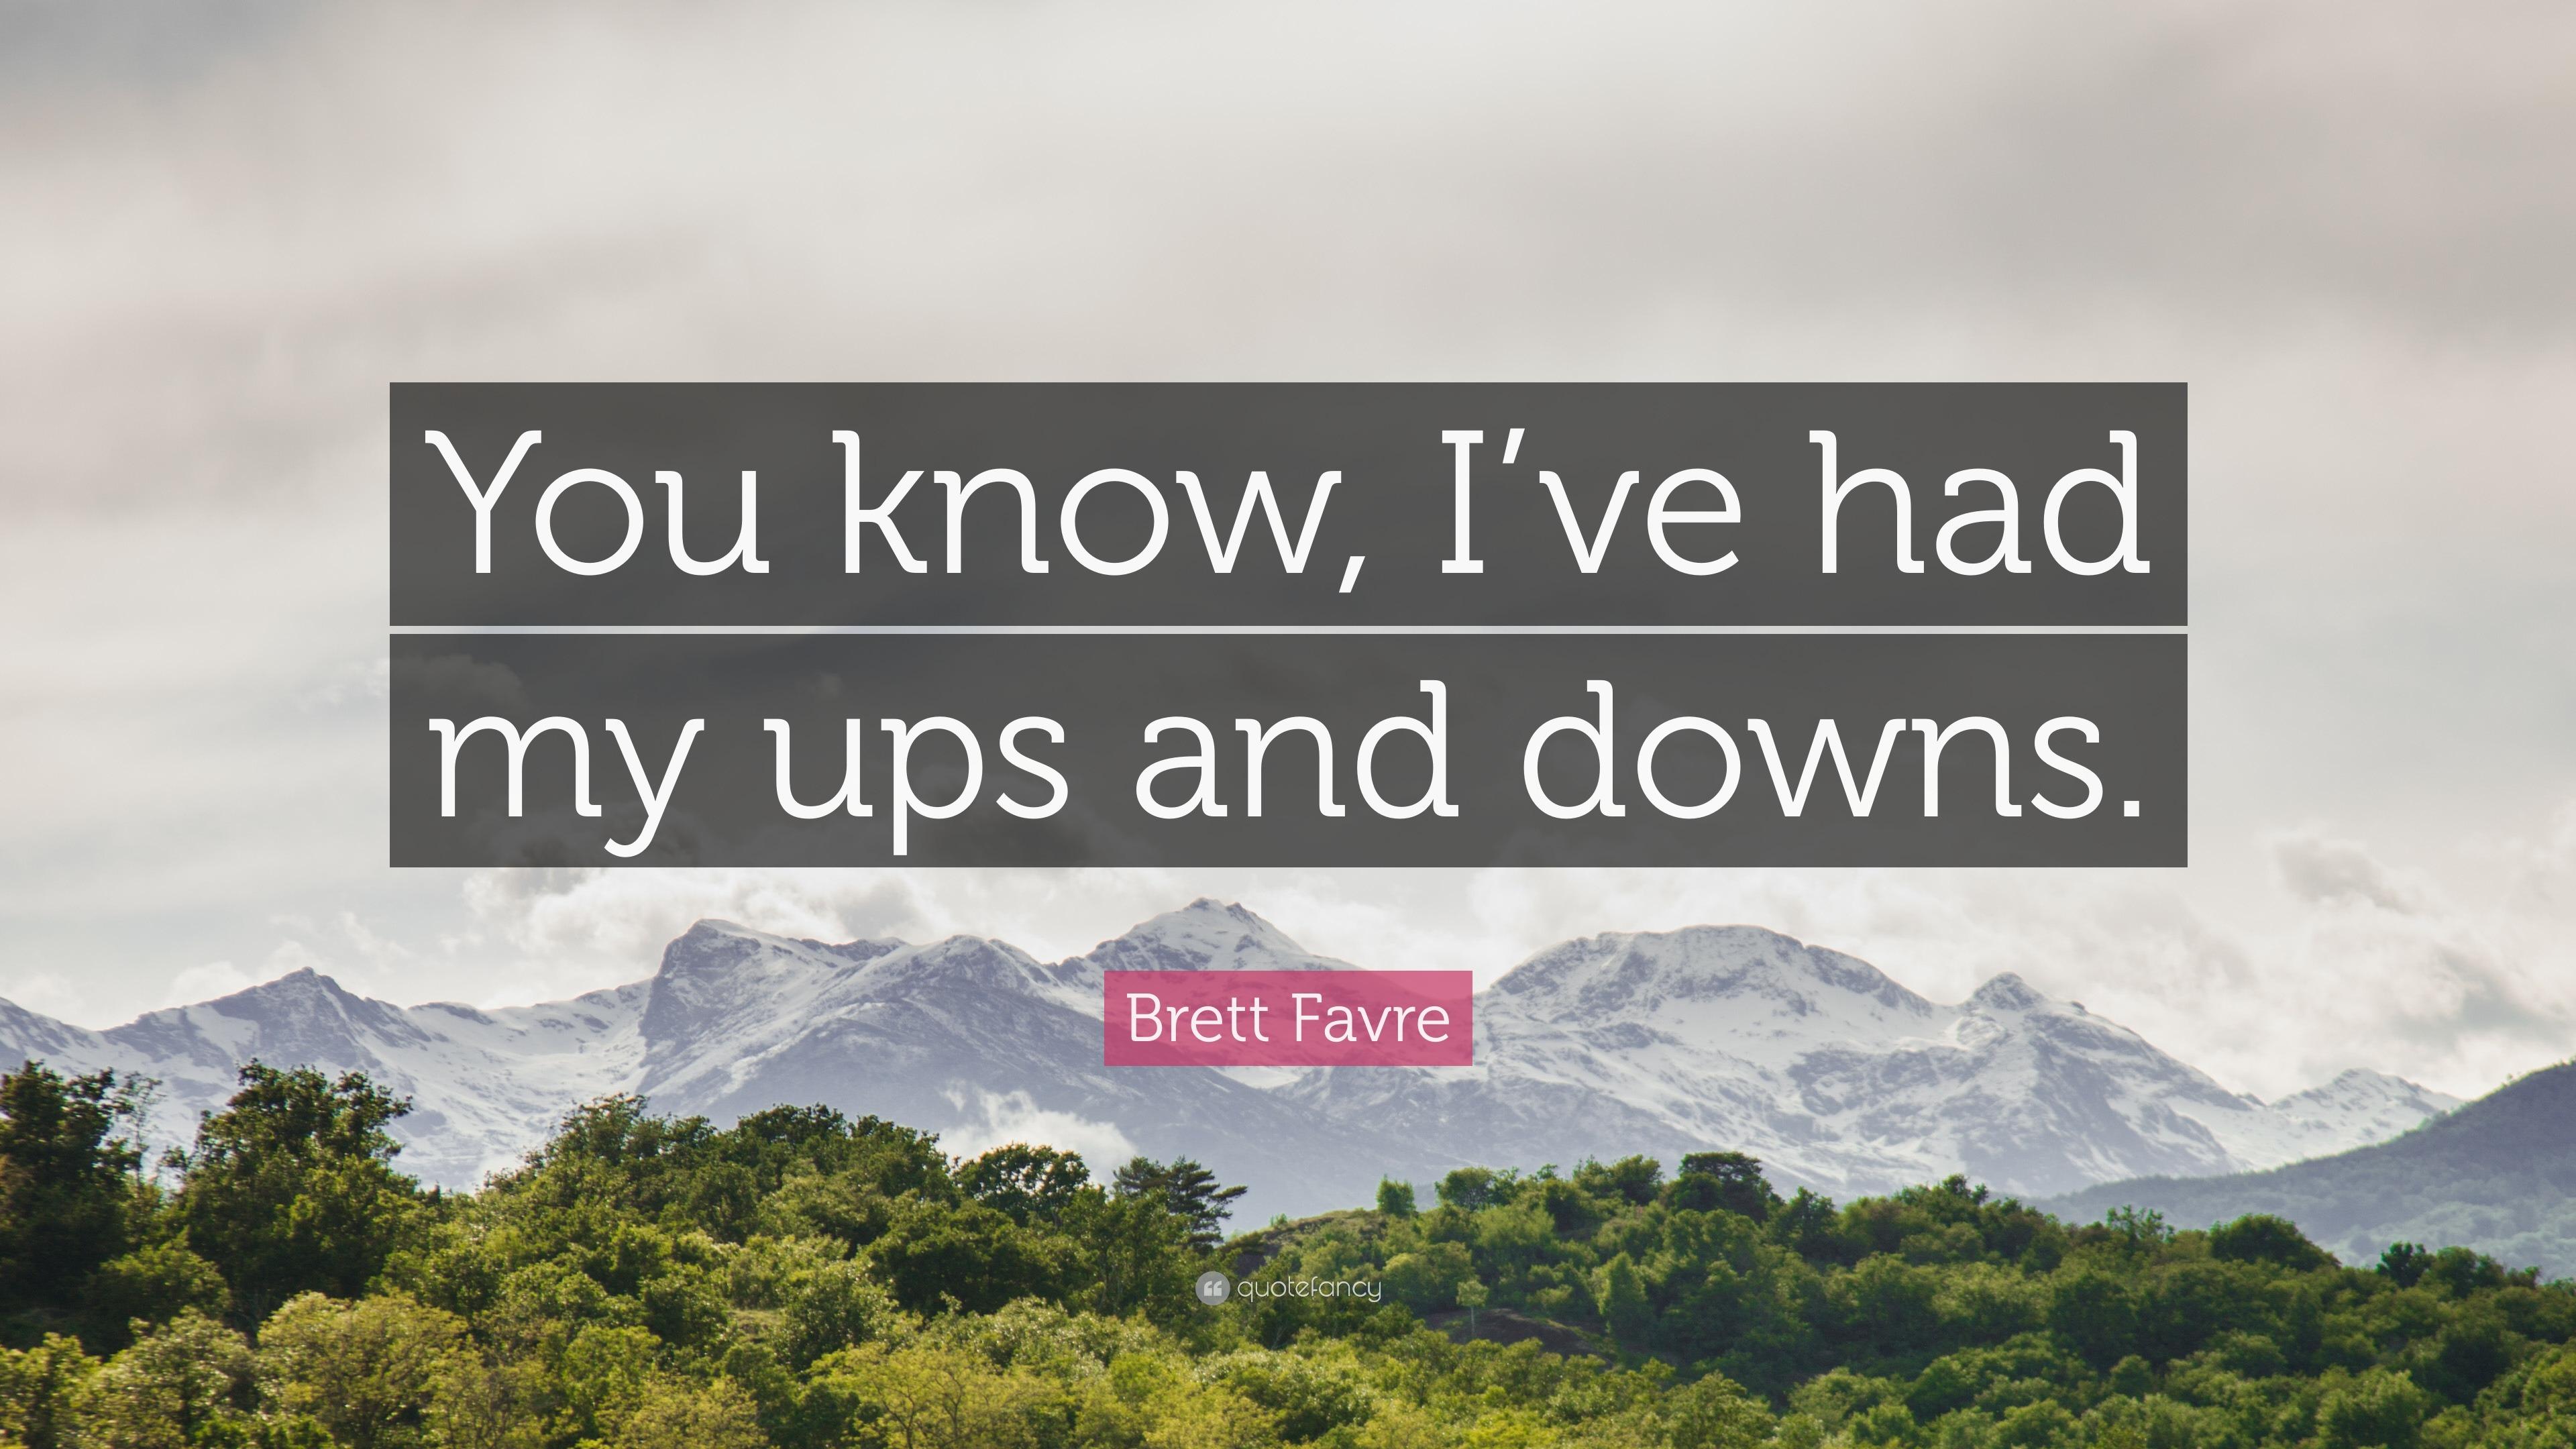 brett favre quotes 79 wallpapers quotefancy